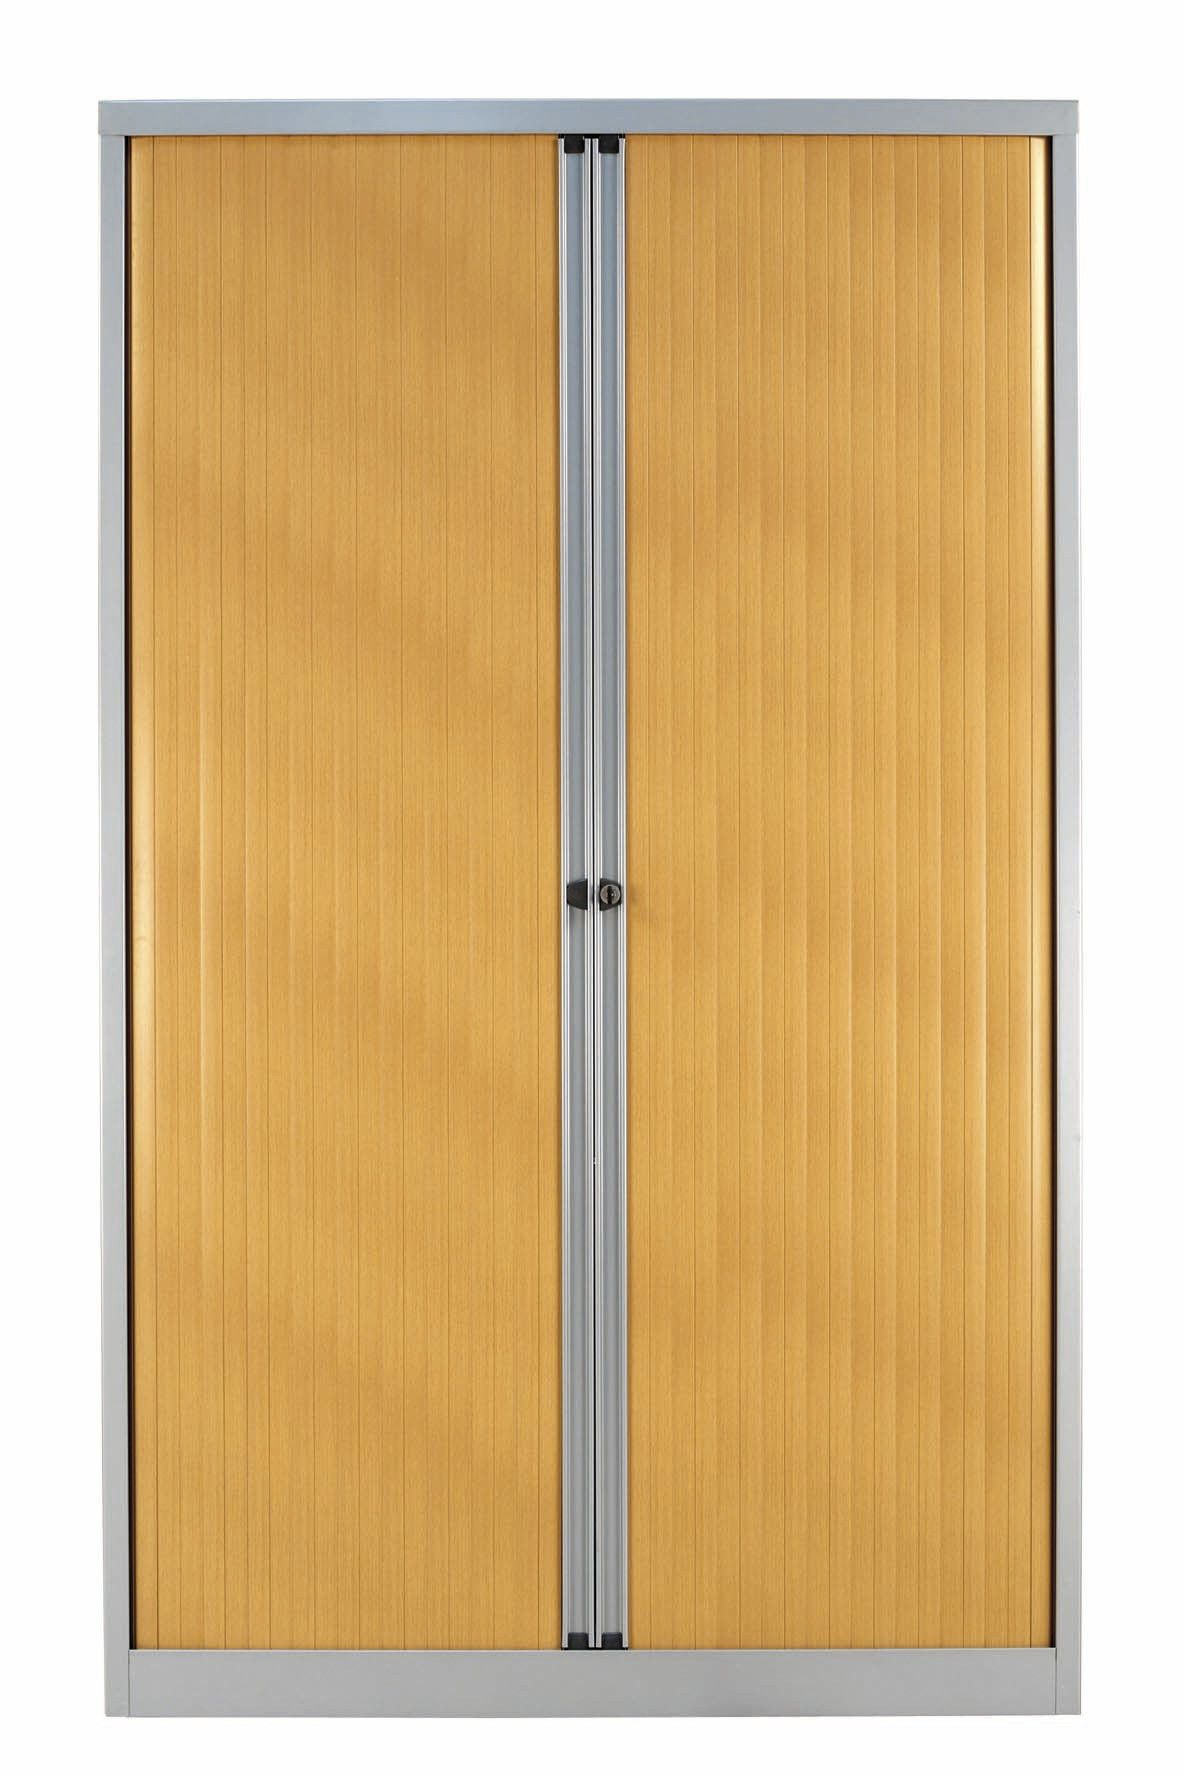 30 Elegant Armoire Metallique Fly Recommandations Armoire M Tallique Avec Serrure Armoire M Tallique De Rangement Ar Tall Cabinet Storage Storage Home Decor